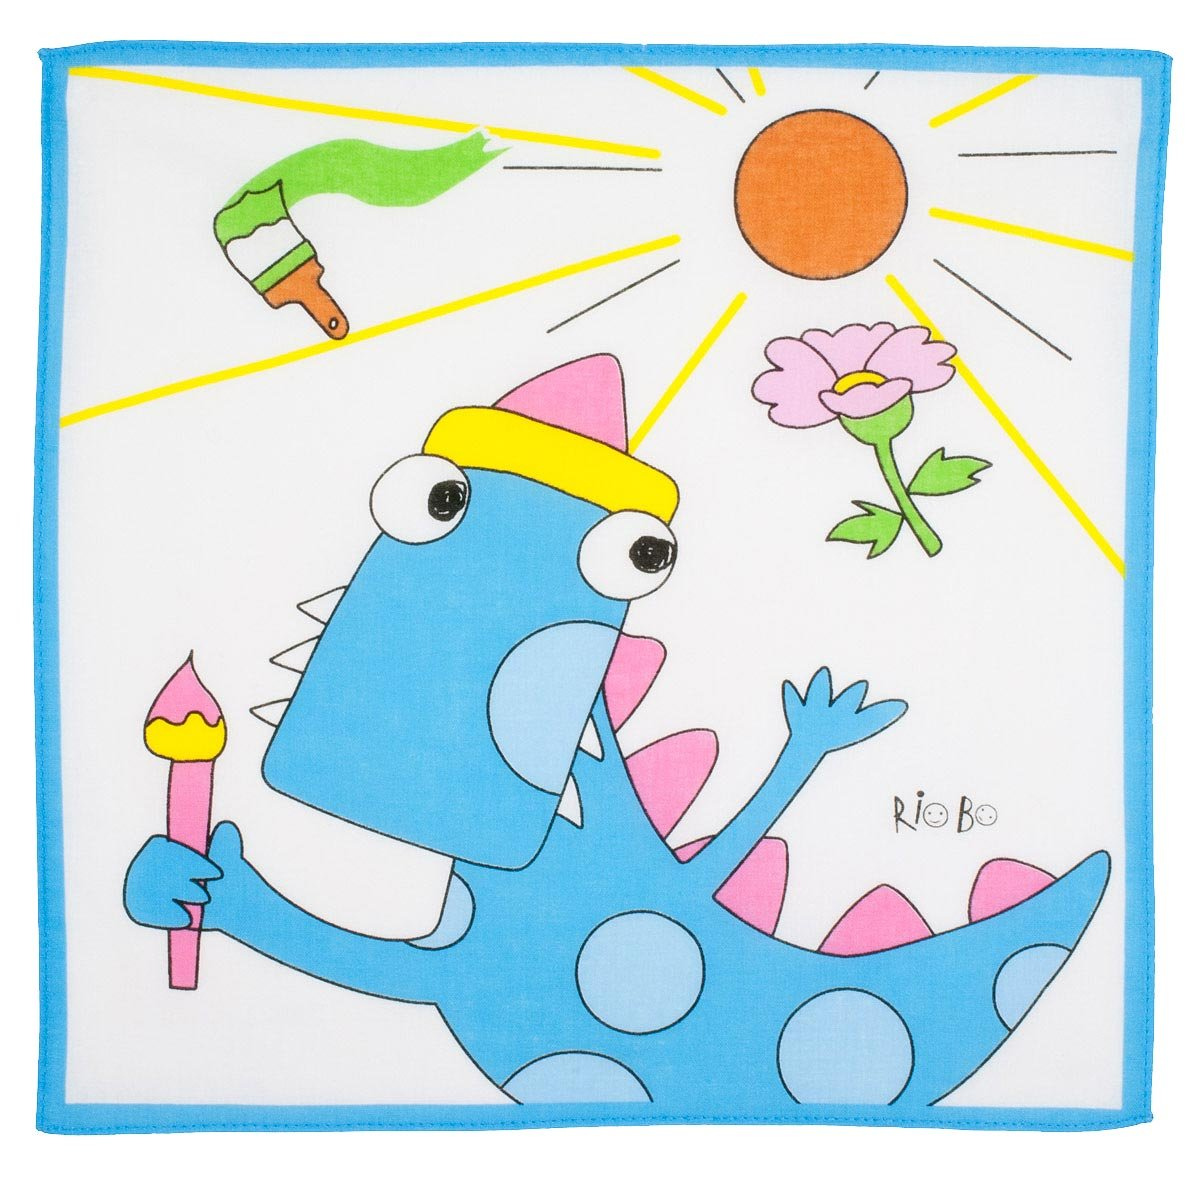 """Dino"" child handkerchiefs - 12"" square - 6 units Merrysquare"